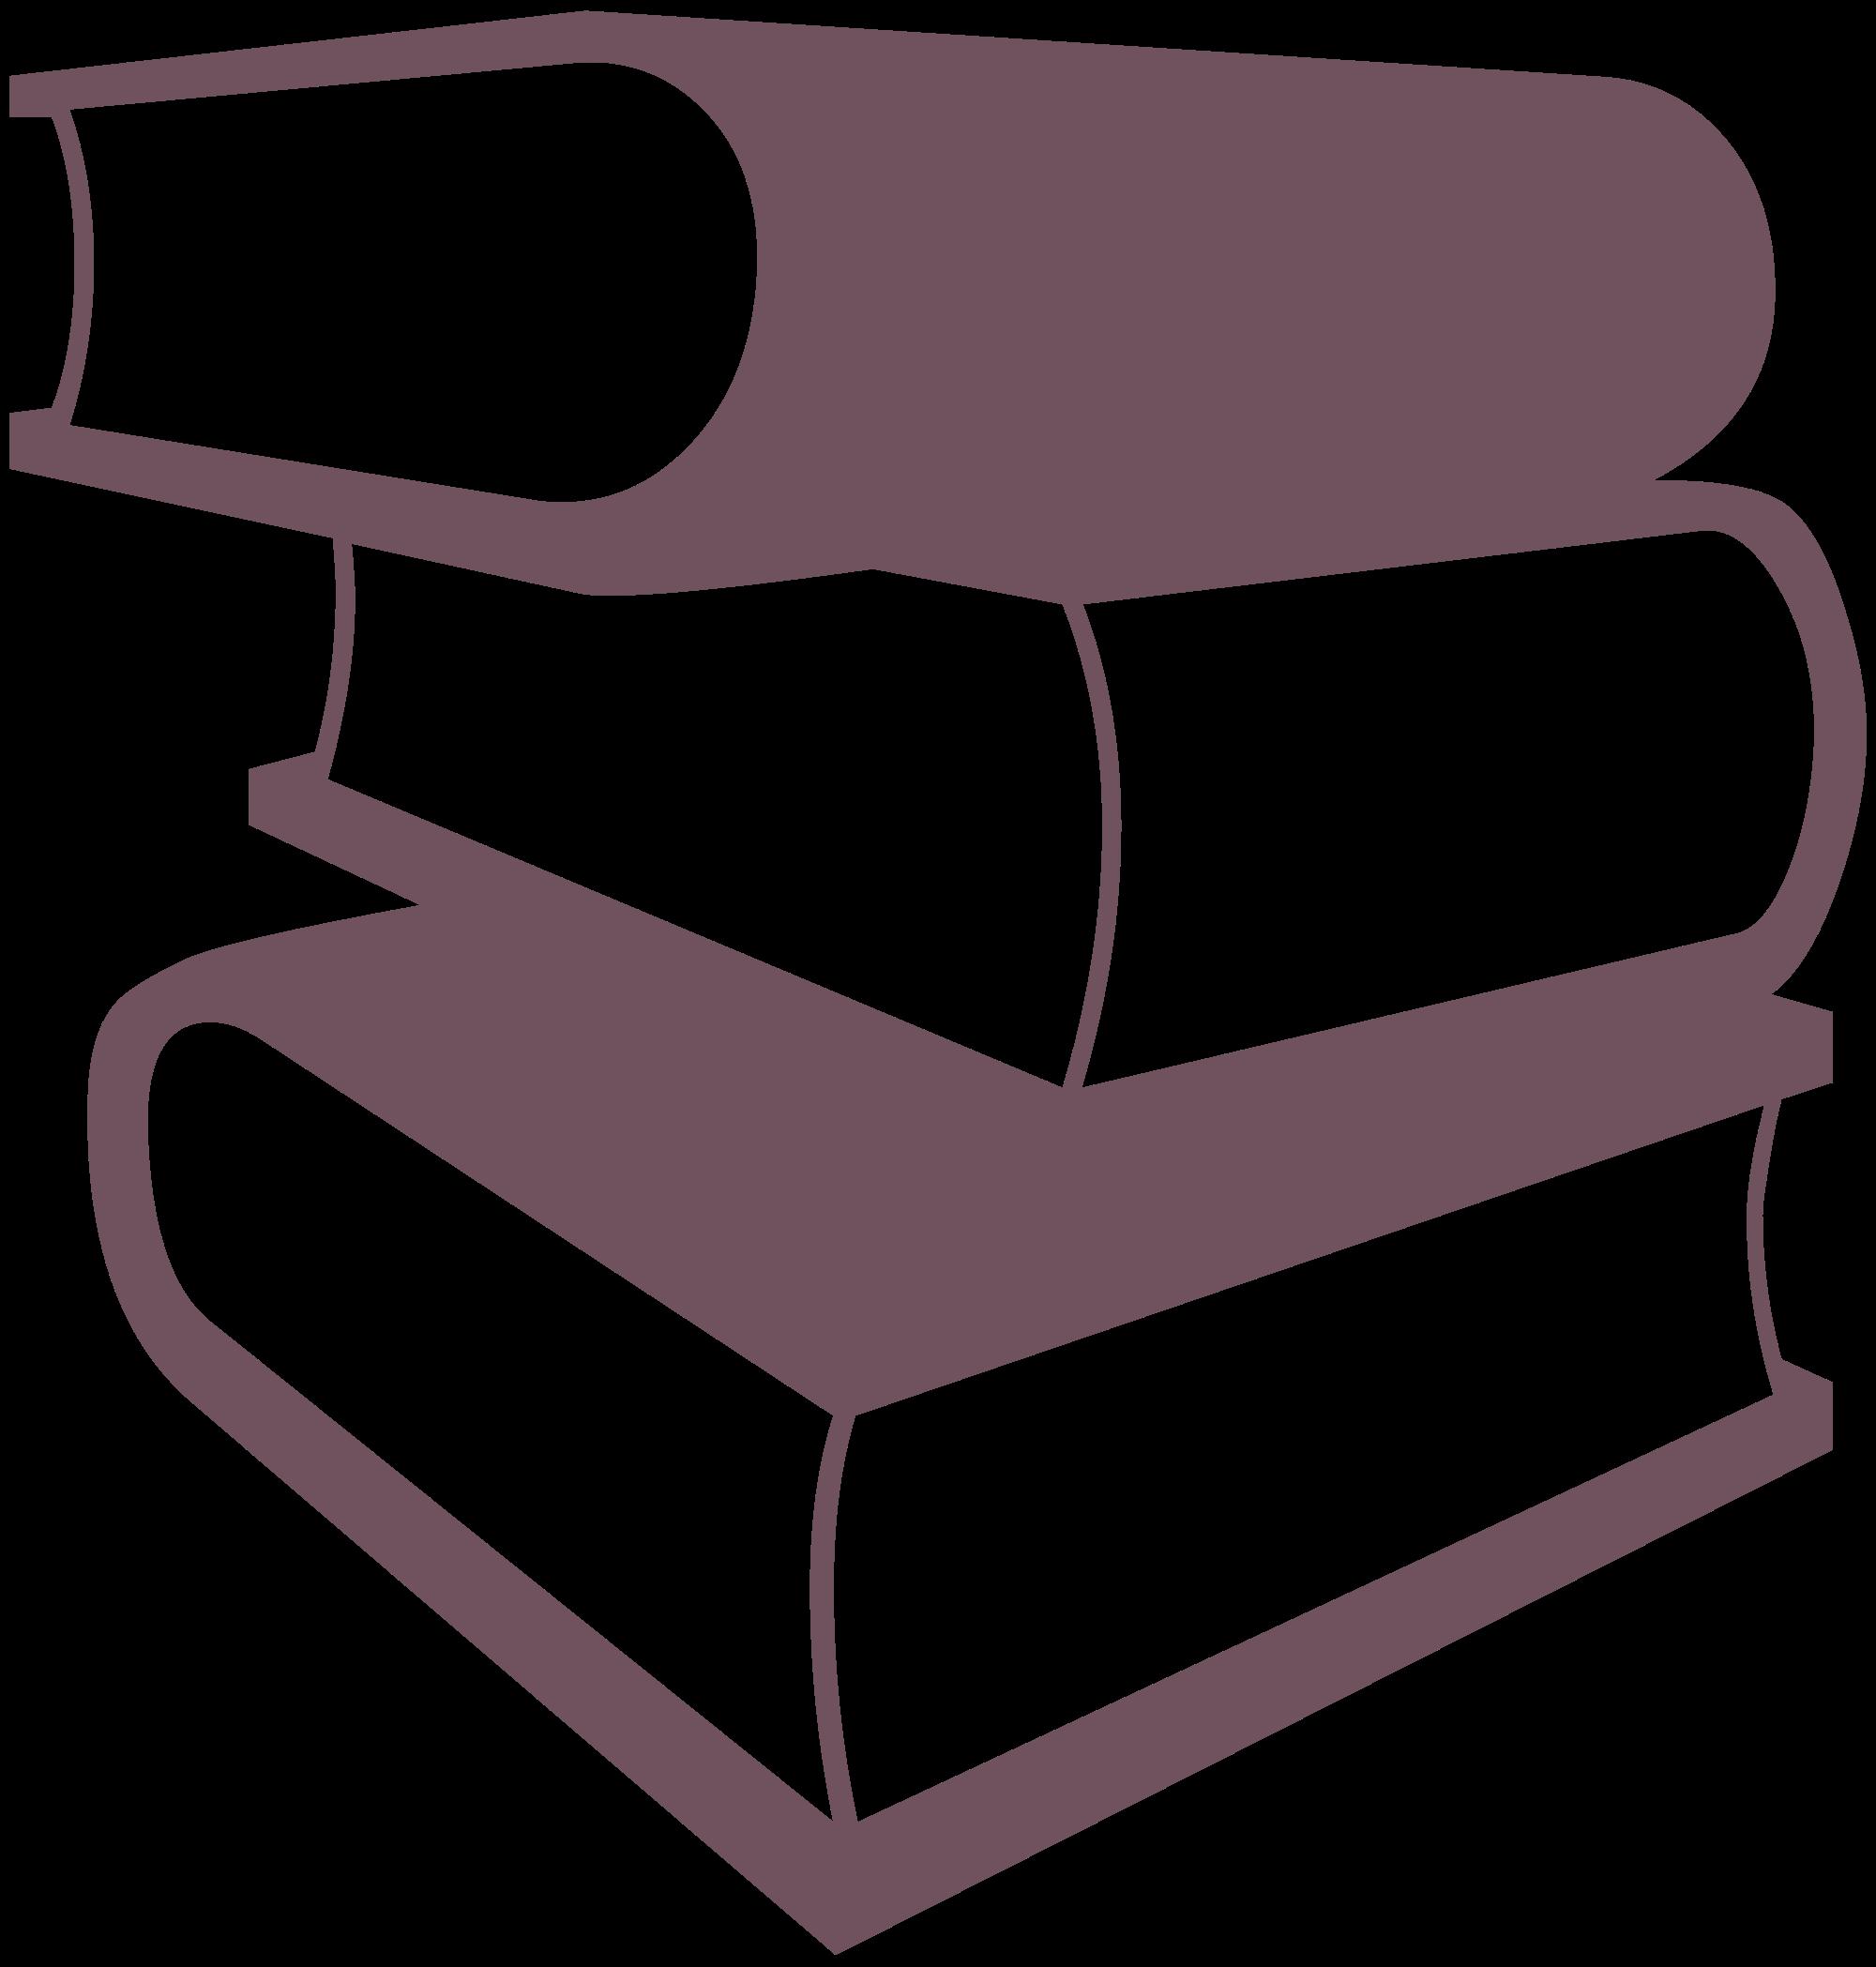 clip art freeuse File wikimedia commons open. Books svg silhouette